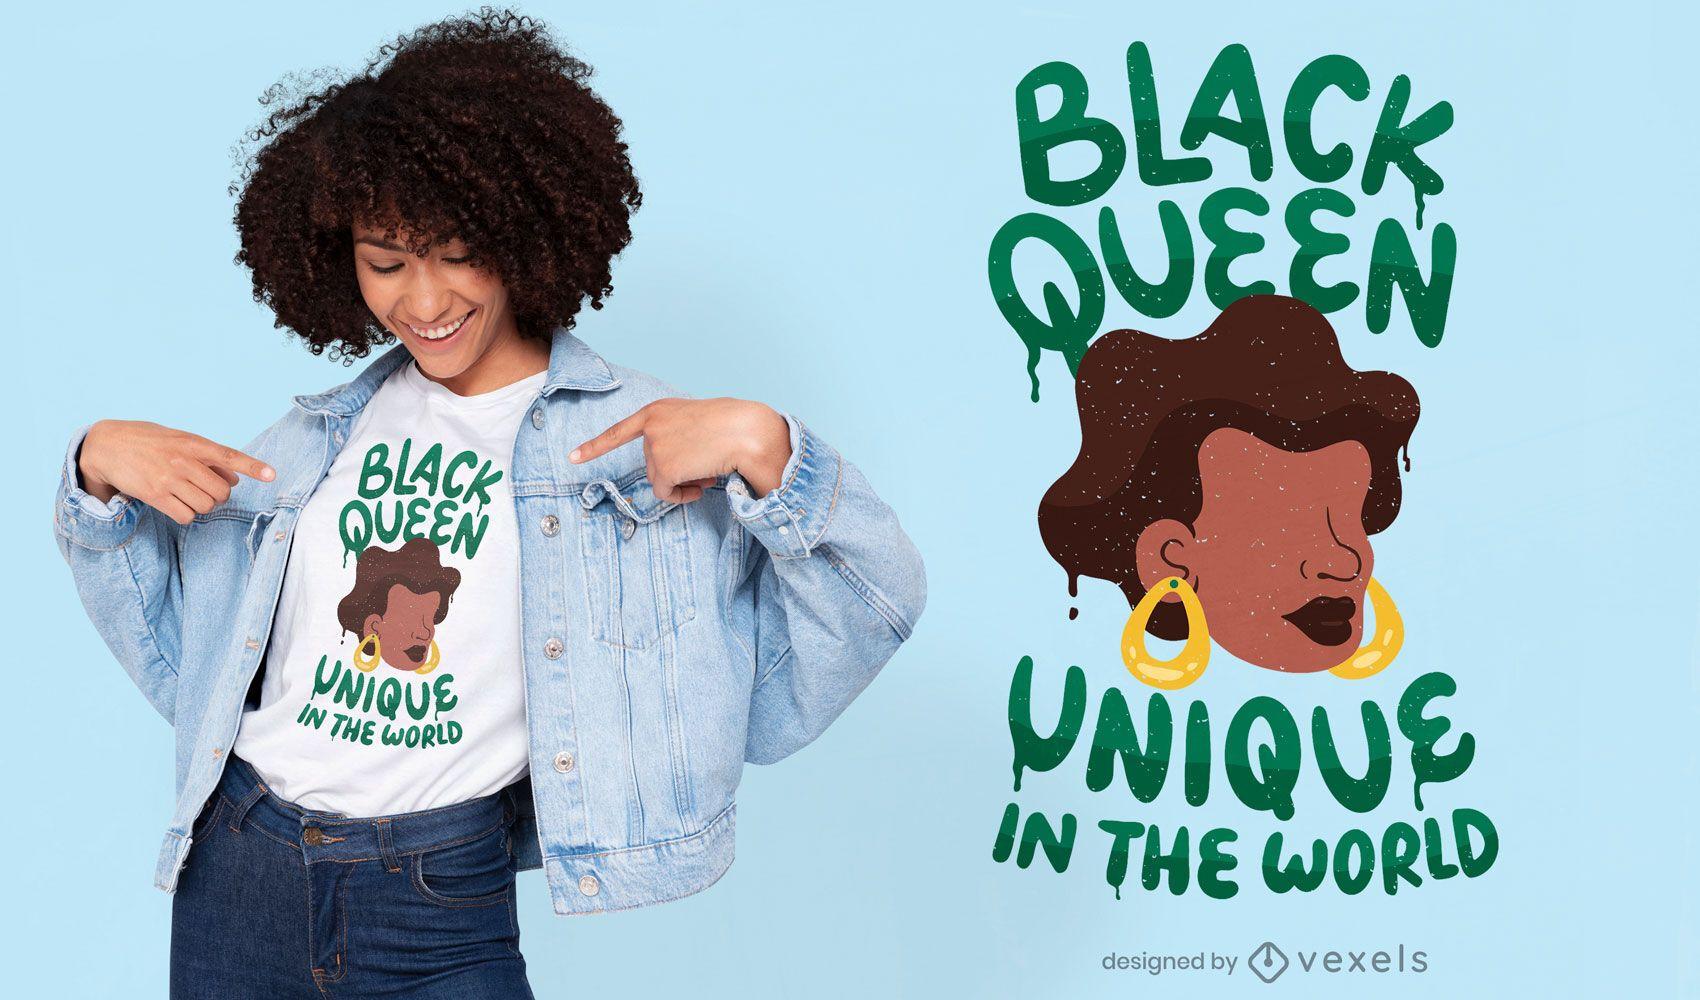 Unique black queen t-shirt design